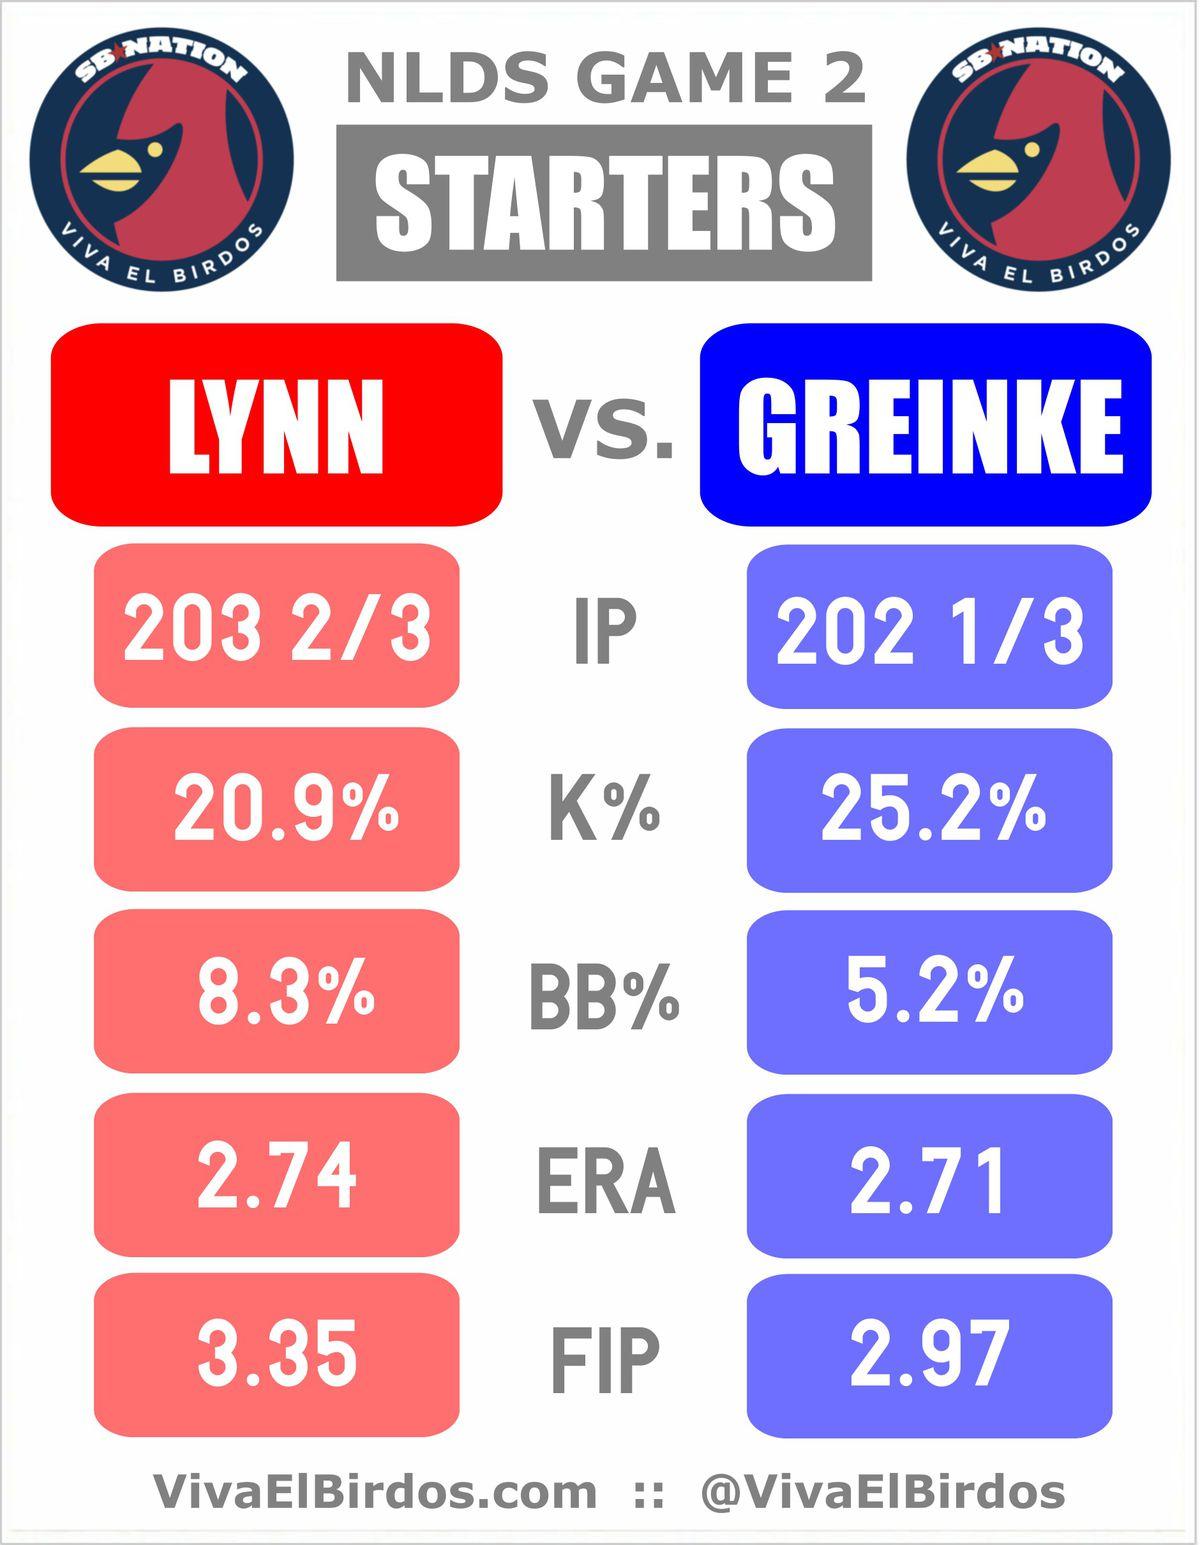 NLDS Game 2 Starting Pitcher Comparison